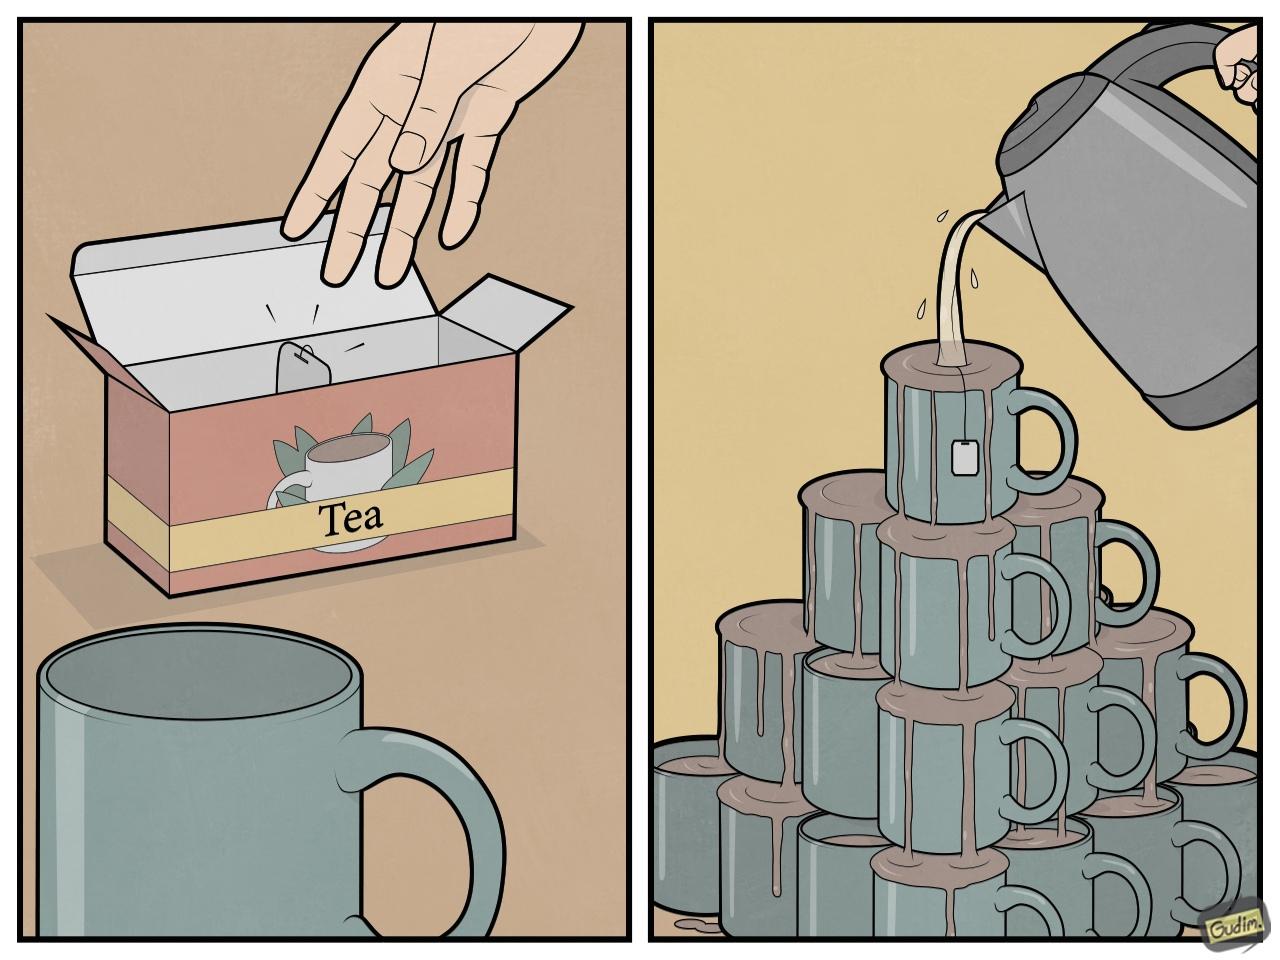 Последний пакетик чая